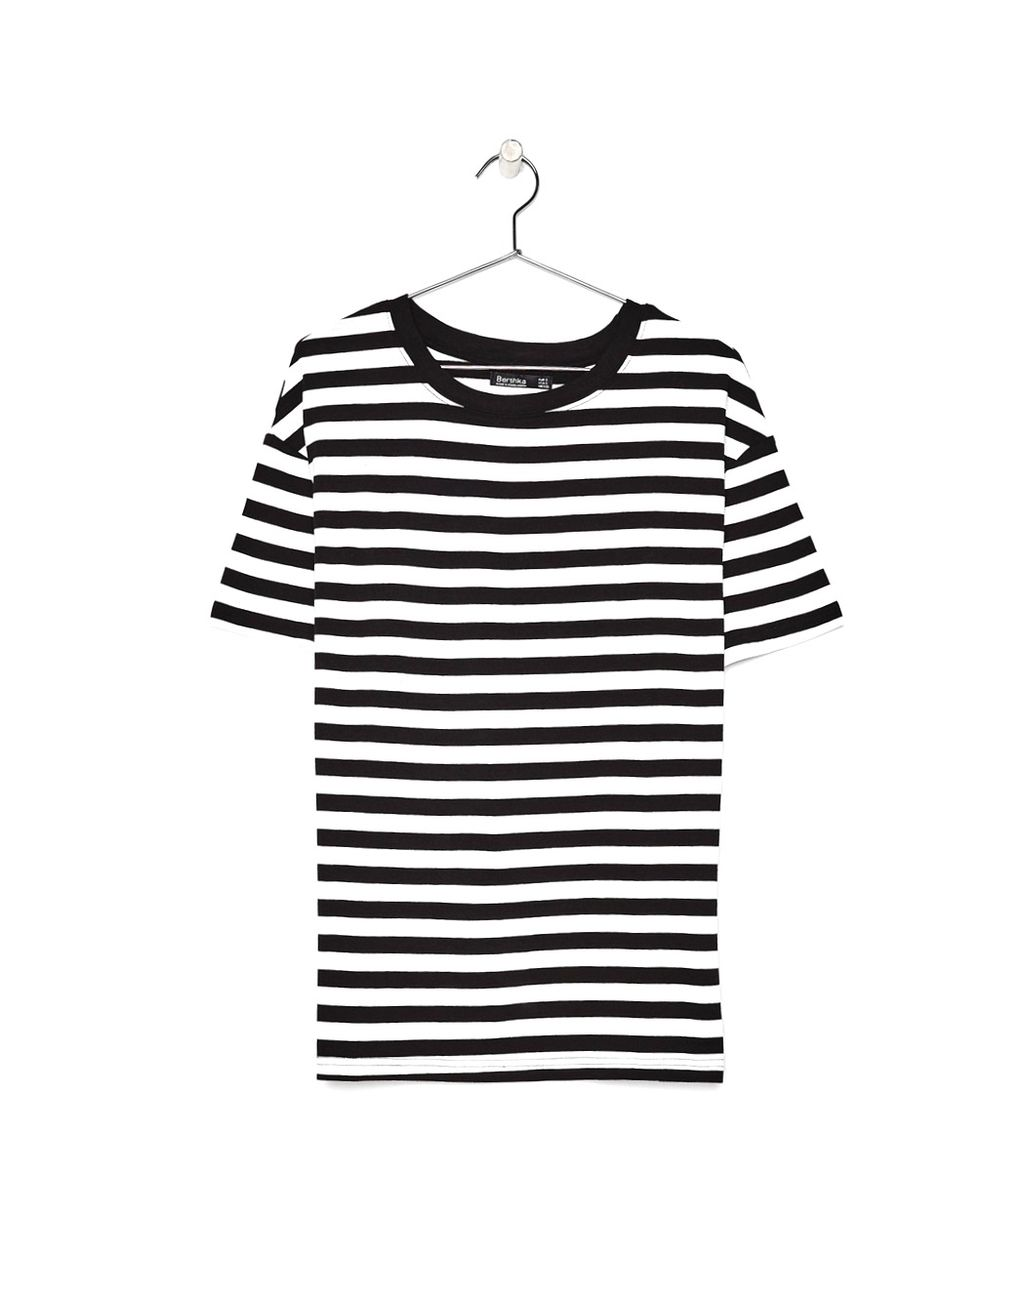 Oversize majica od organskog pamuka, Bershka, 49 kn